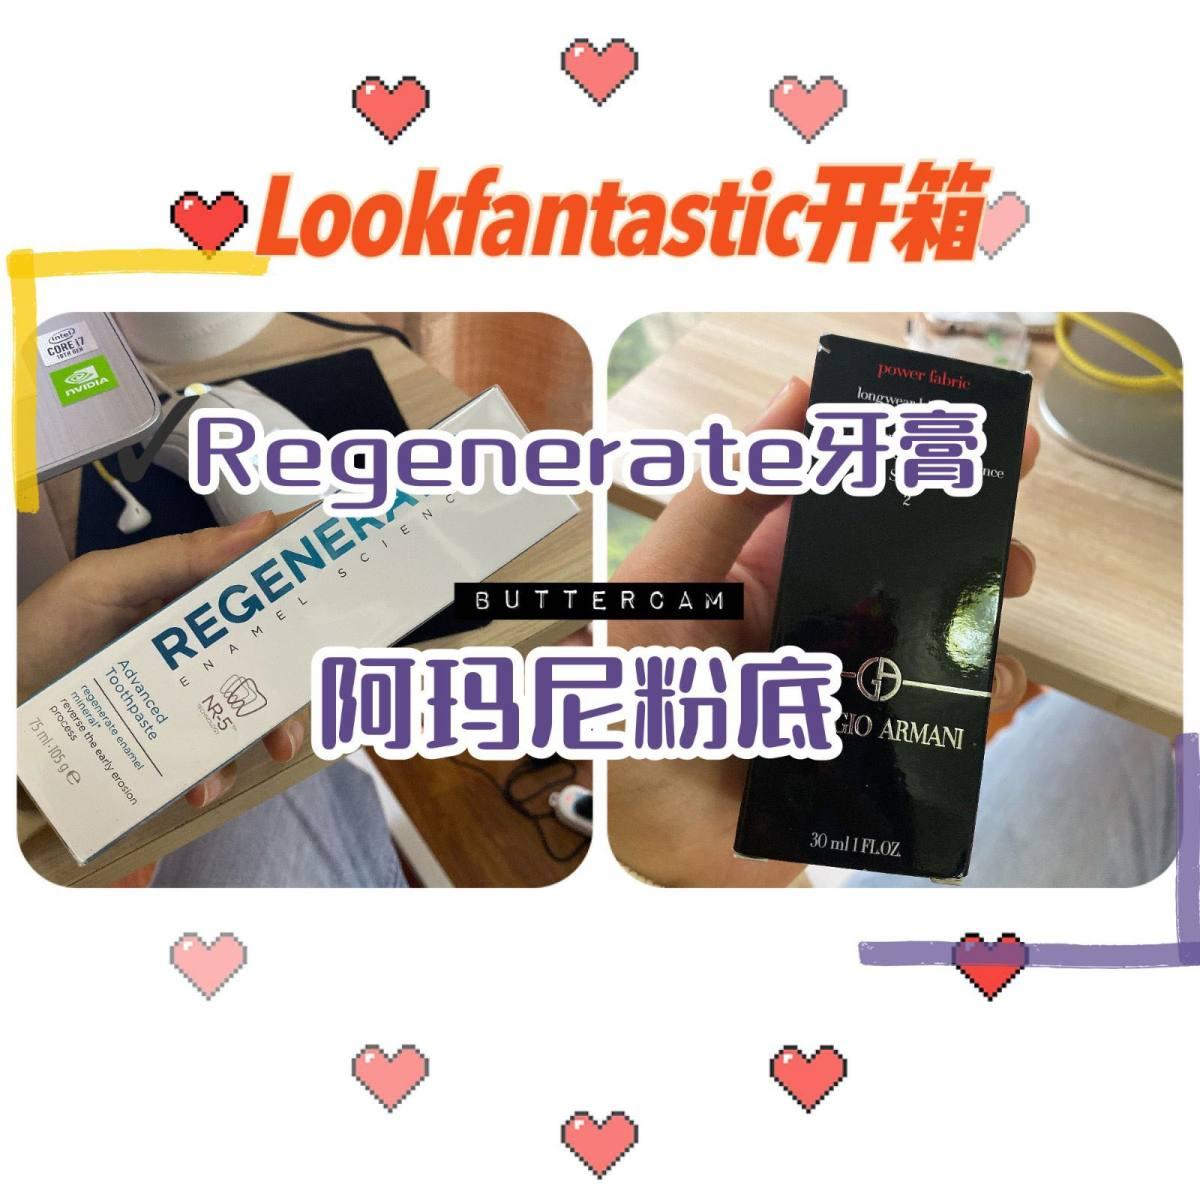 lookfantastic开箱记---Regenerate牙